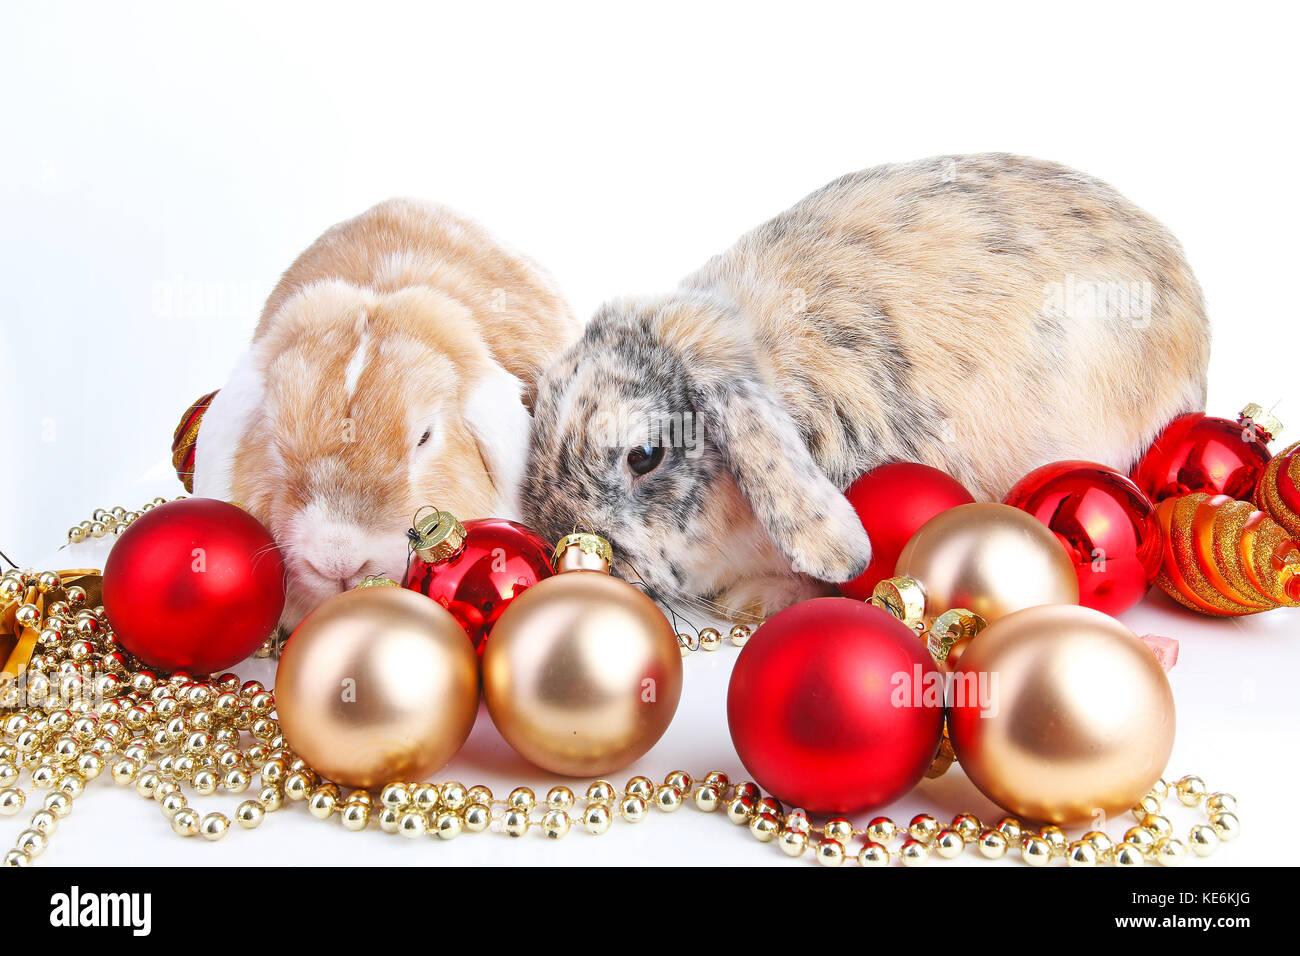 Christmas Animals Christmas Pets Cute Lop Eared Rabbit